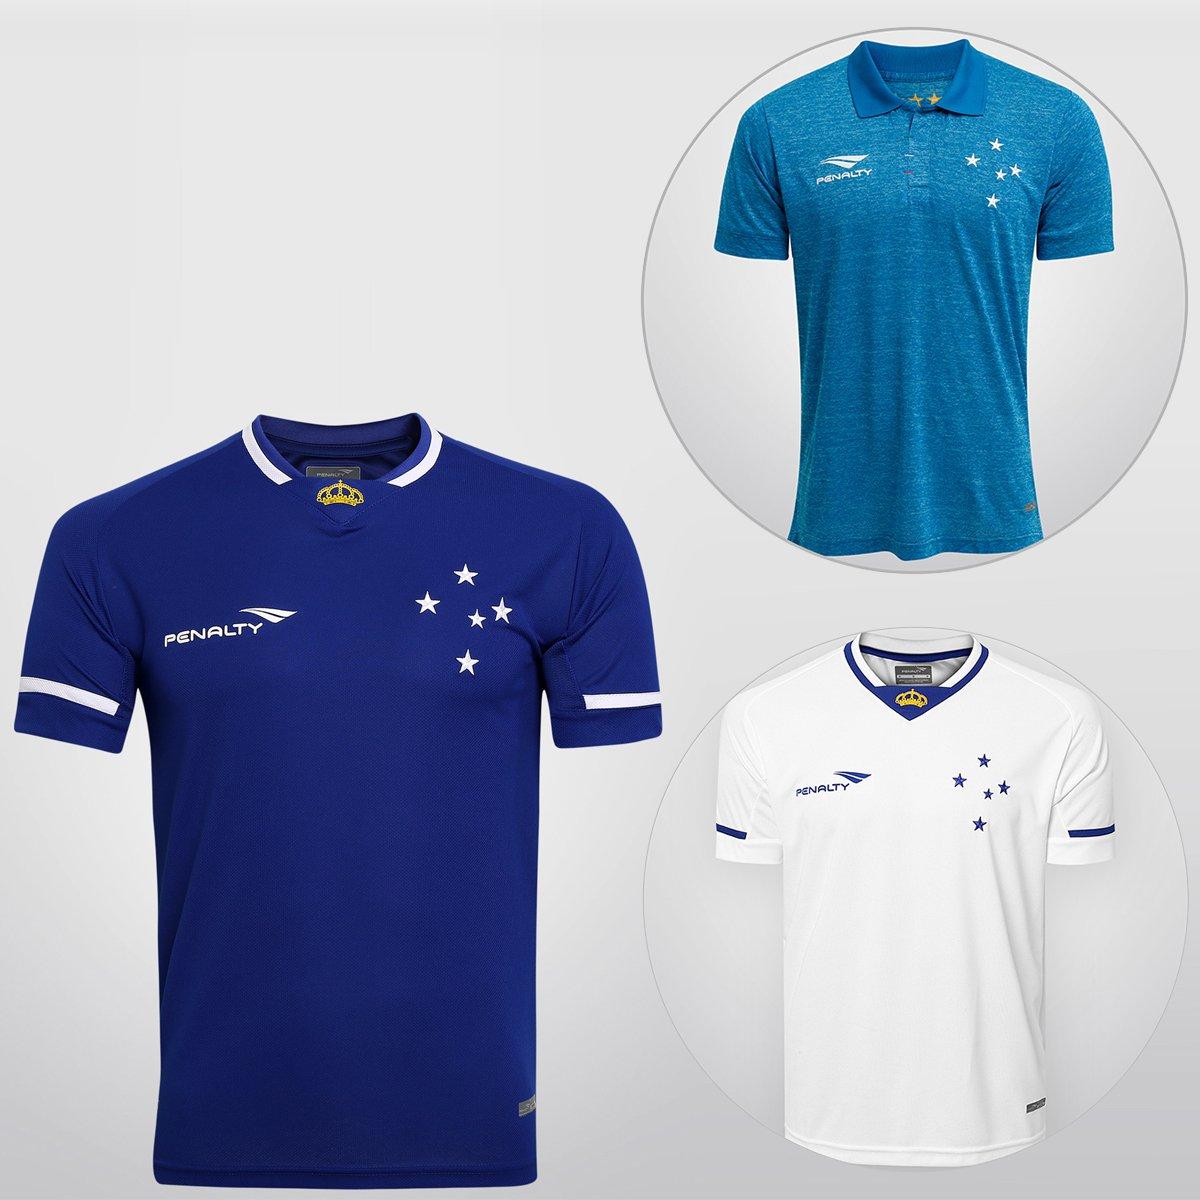 bb029d72e5 Super Kit Penalty Cruzeiro - Camisa I 15 16 s nº + Camisa II 15 16 s nº +  Camisa III 15 16 s nº - Compre Agora